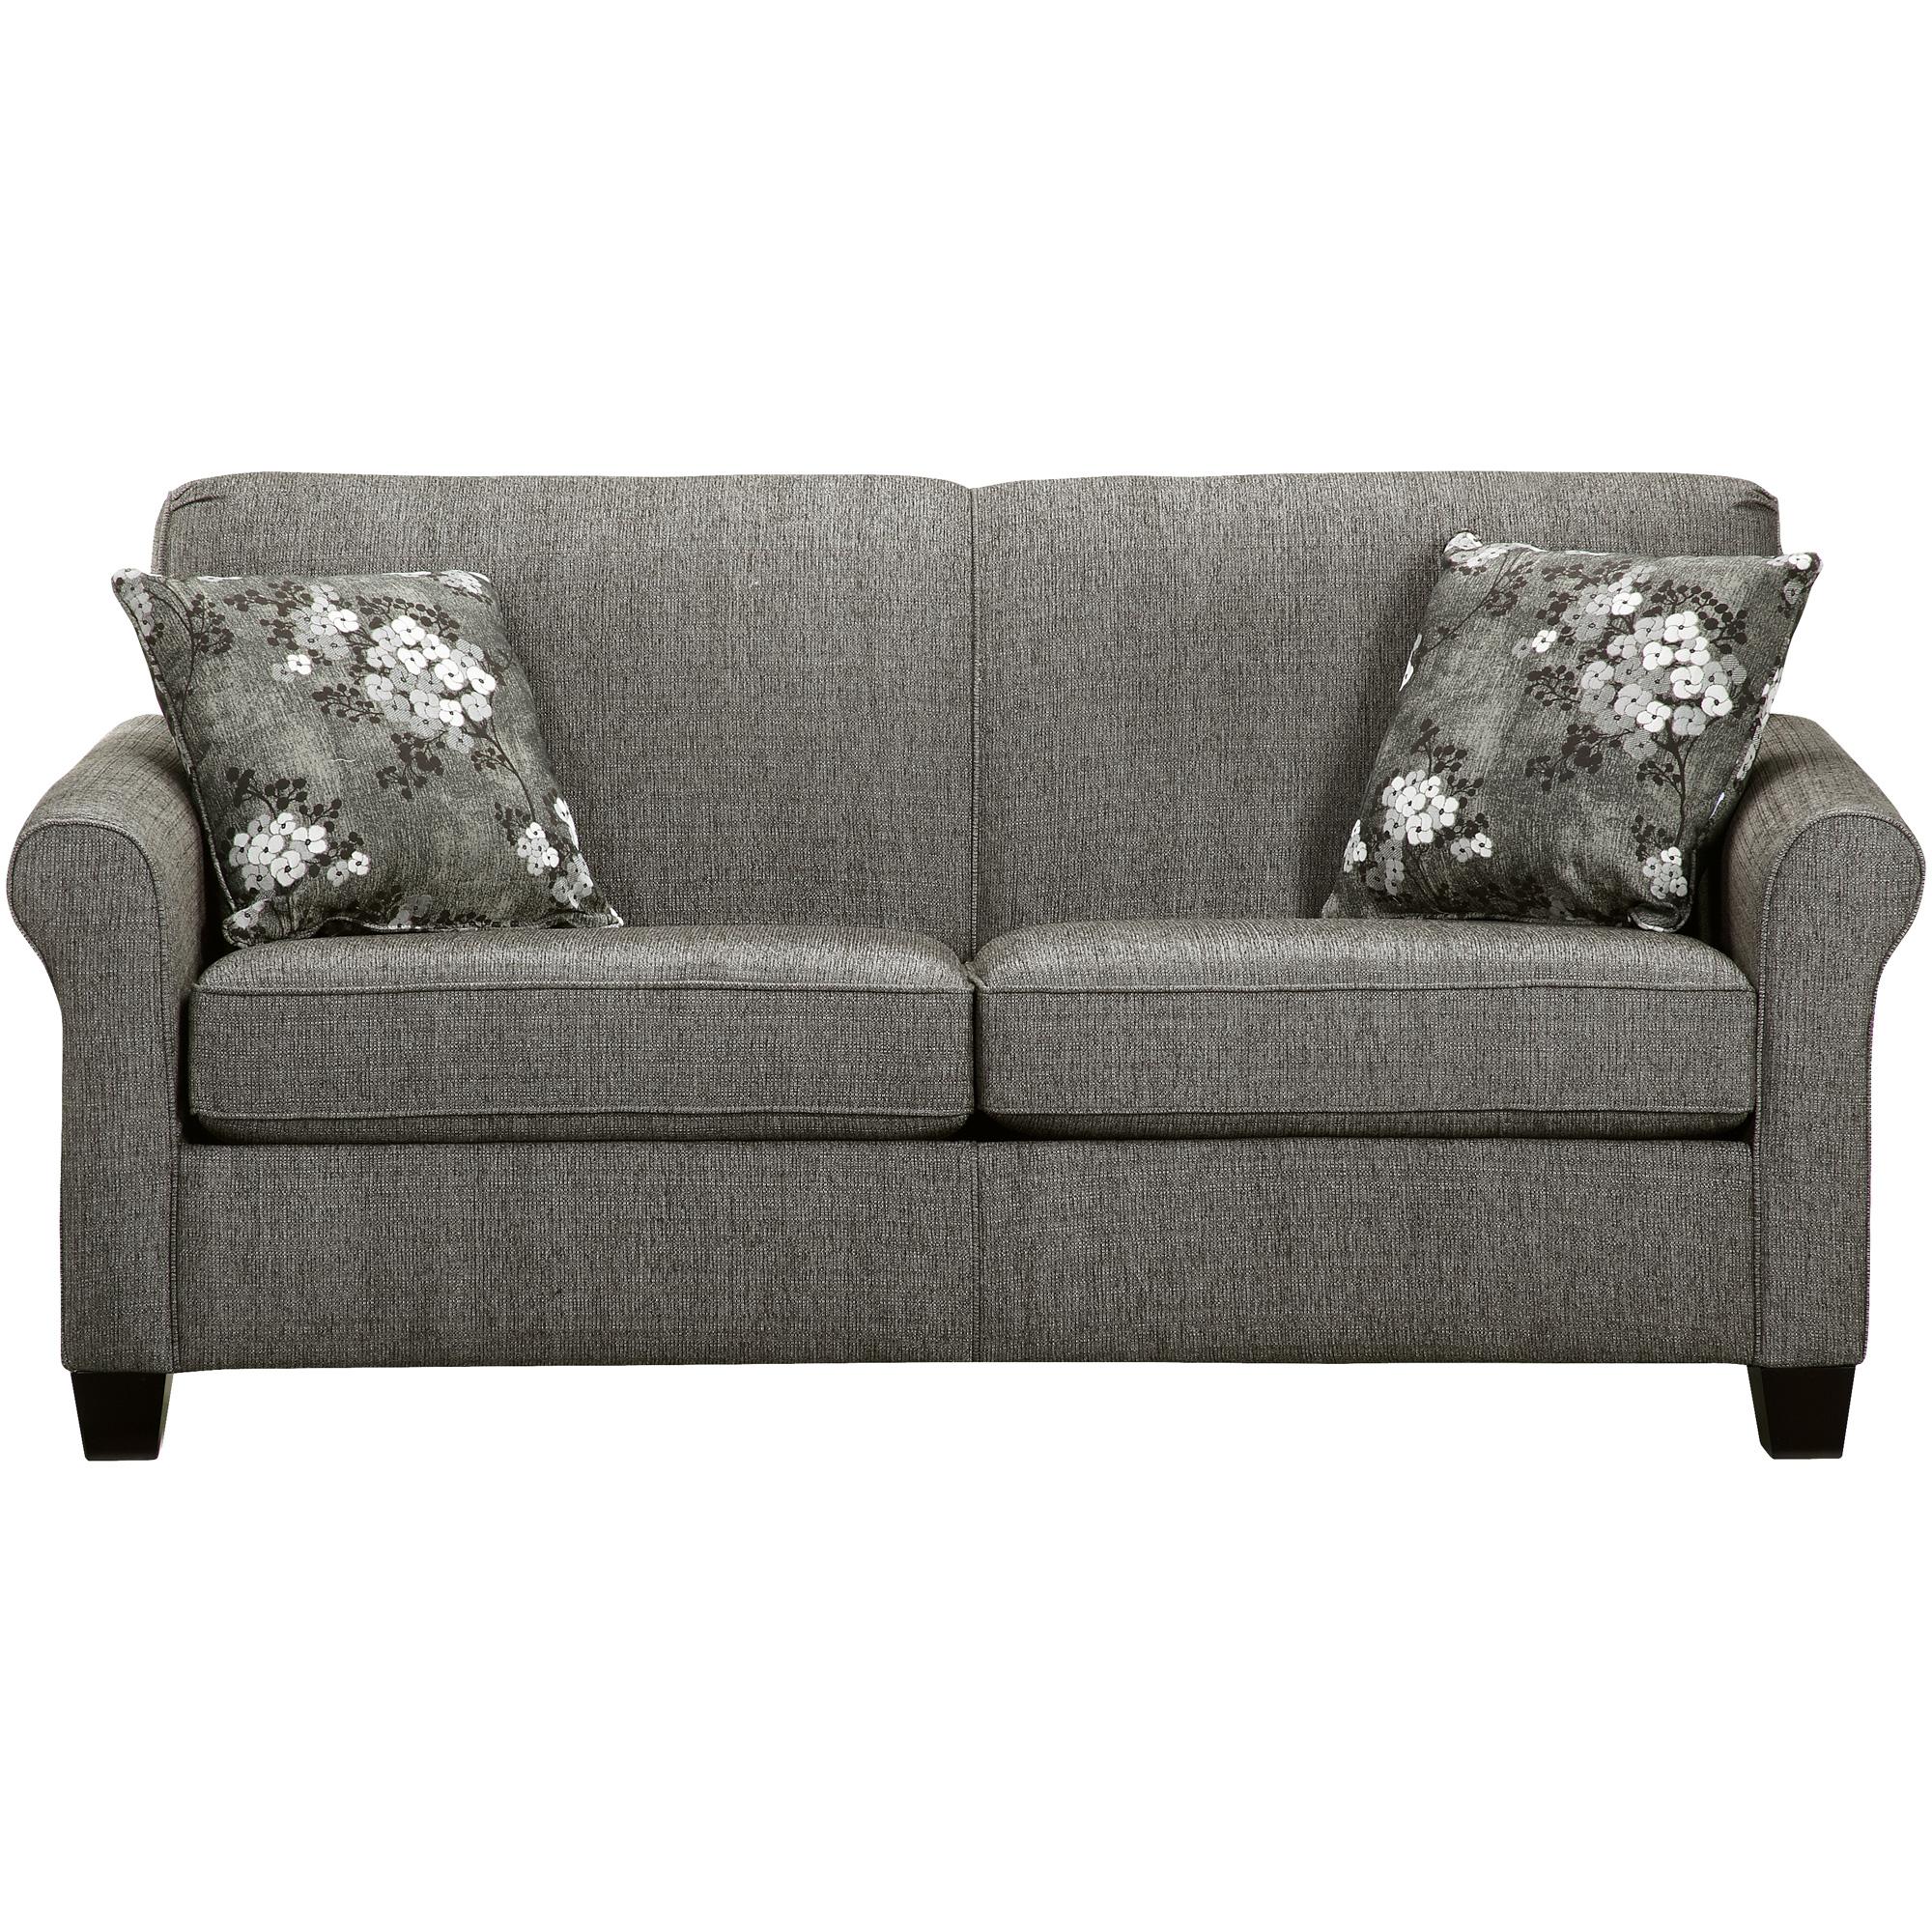 Dimensions By England | York Granite Full Air Sleeper Sofa